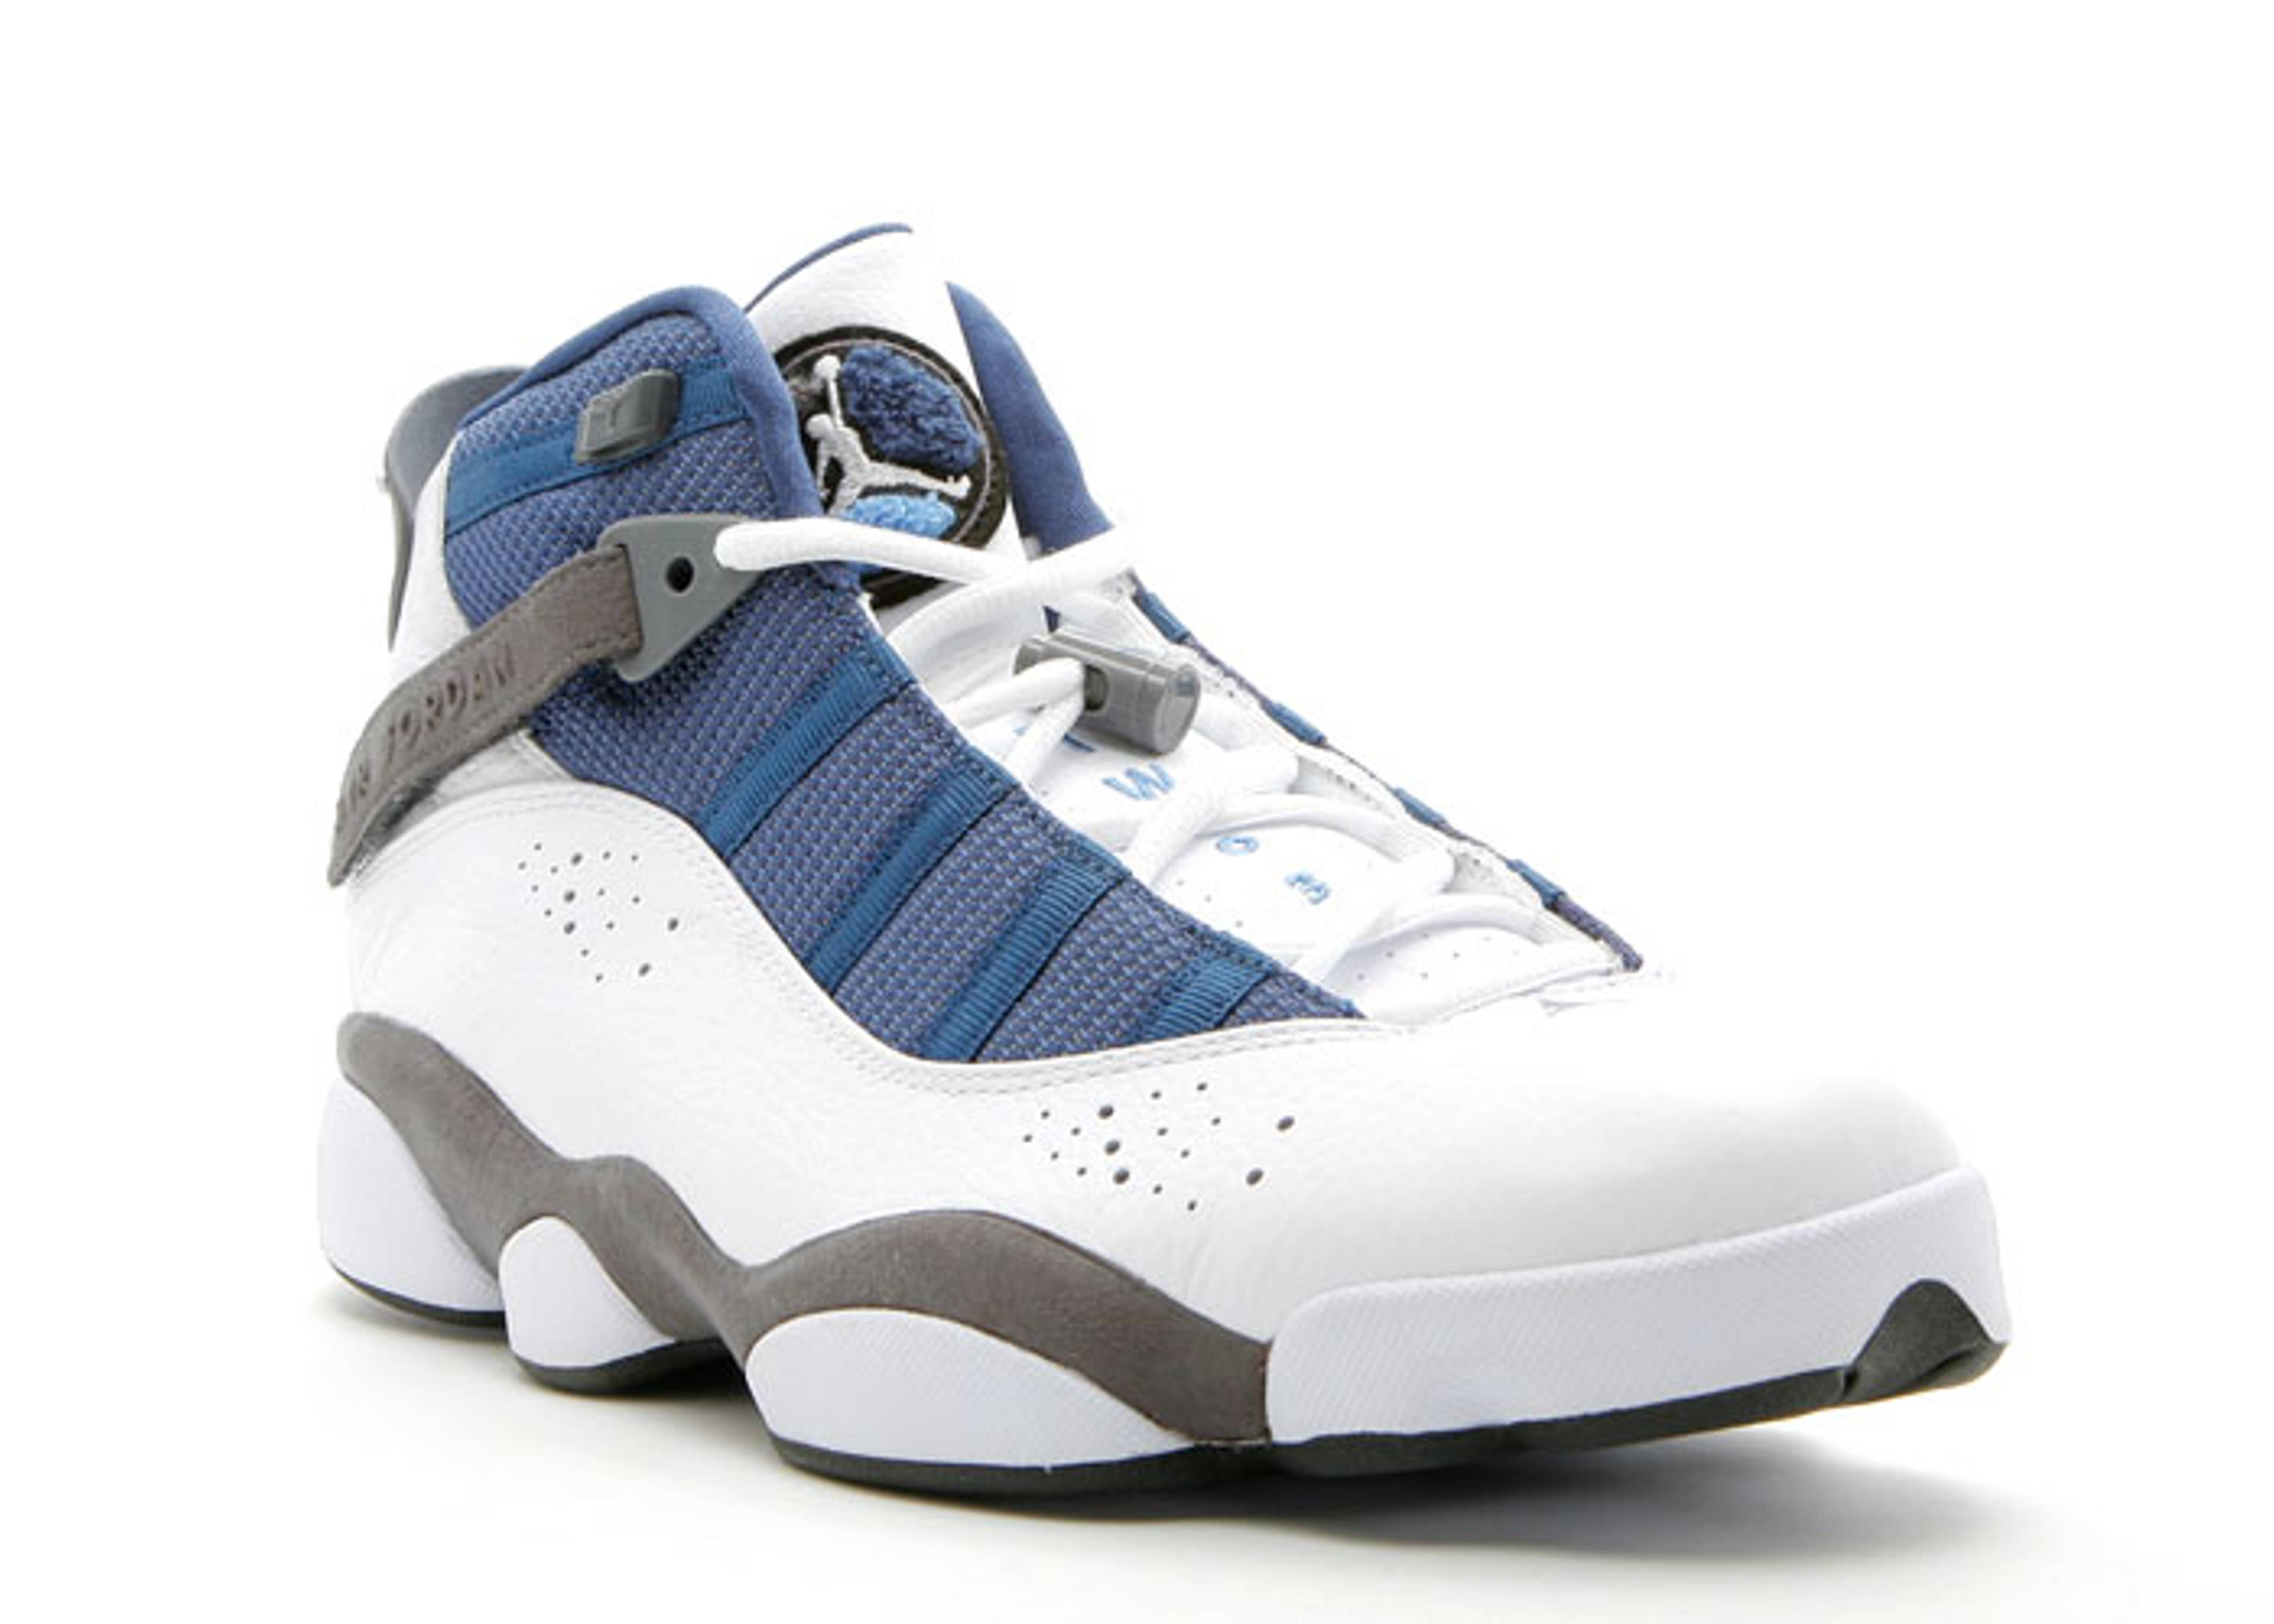 1c3bae1aa90bd0 Air Jordan 6 Rings White Flint Grey French Blue 322992-141 . air jordan.